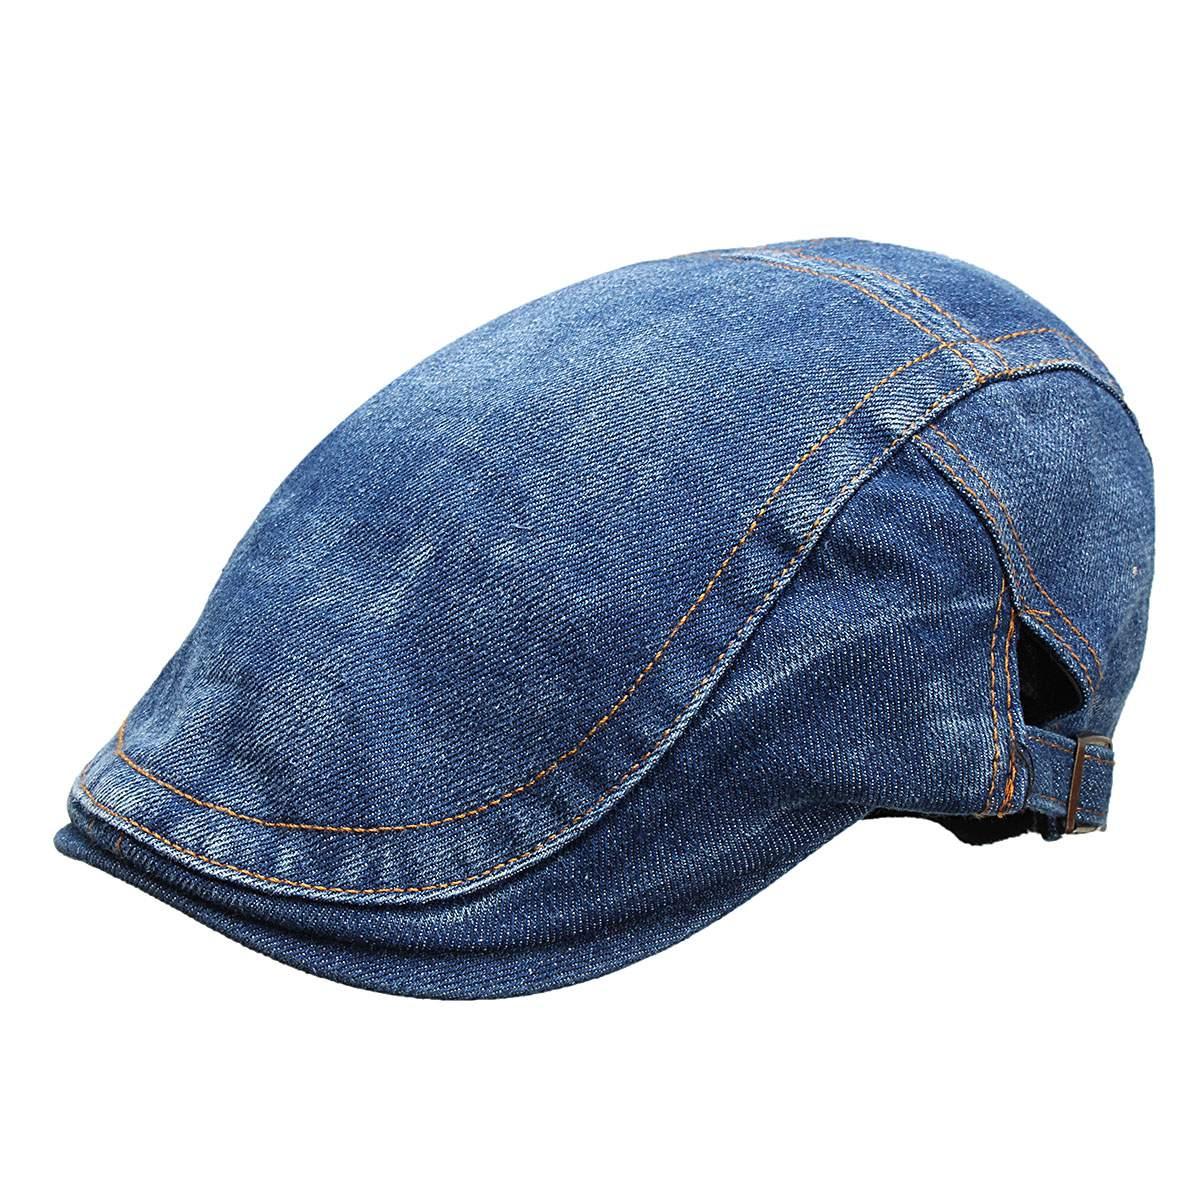 2020 Autumn Jeans Beret Hat for Men Women Casual Outdoor Unisex Denim Beret Cap Fitted Sun Flat Cap Fashion Flat Cap Dark Blue